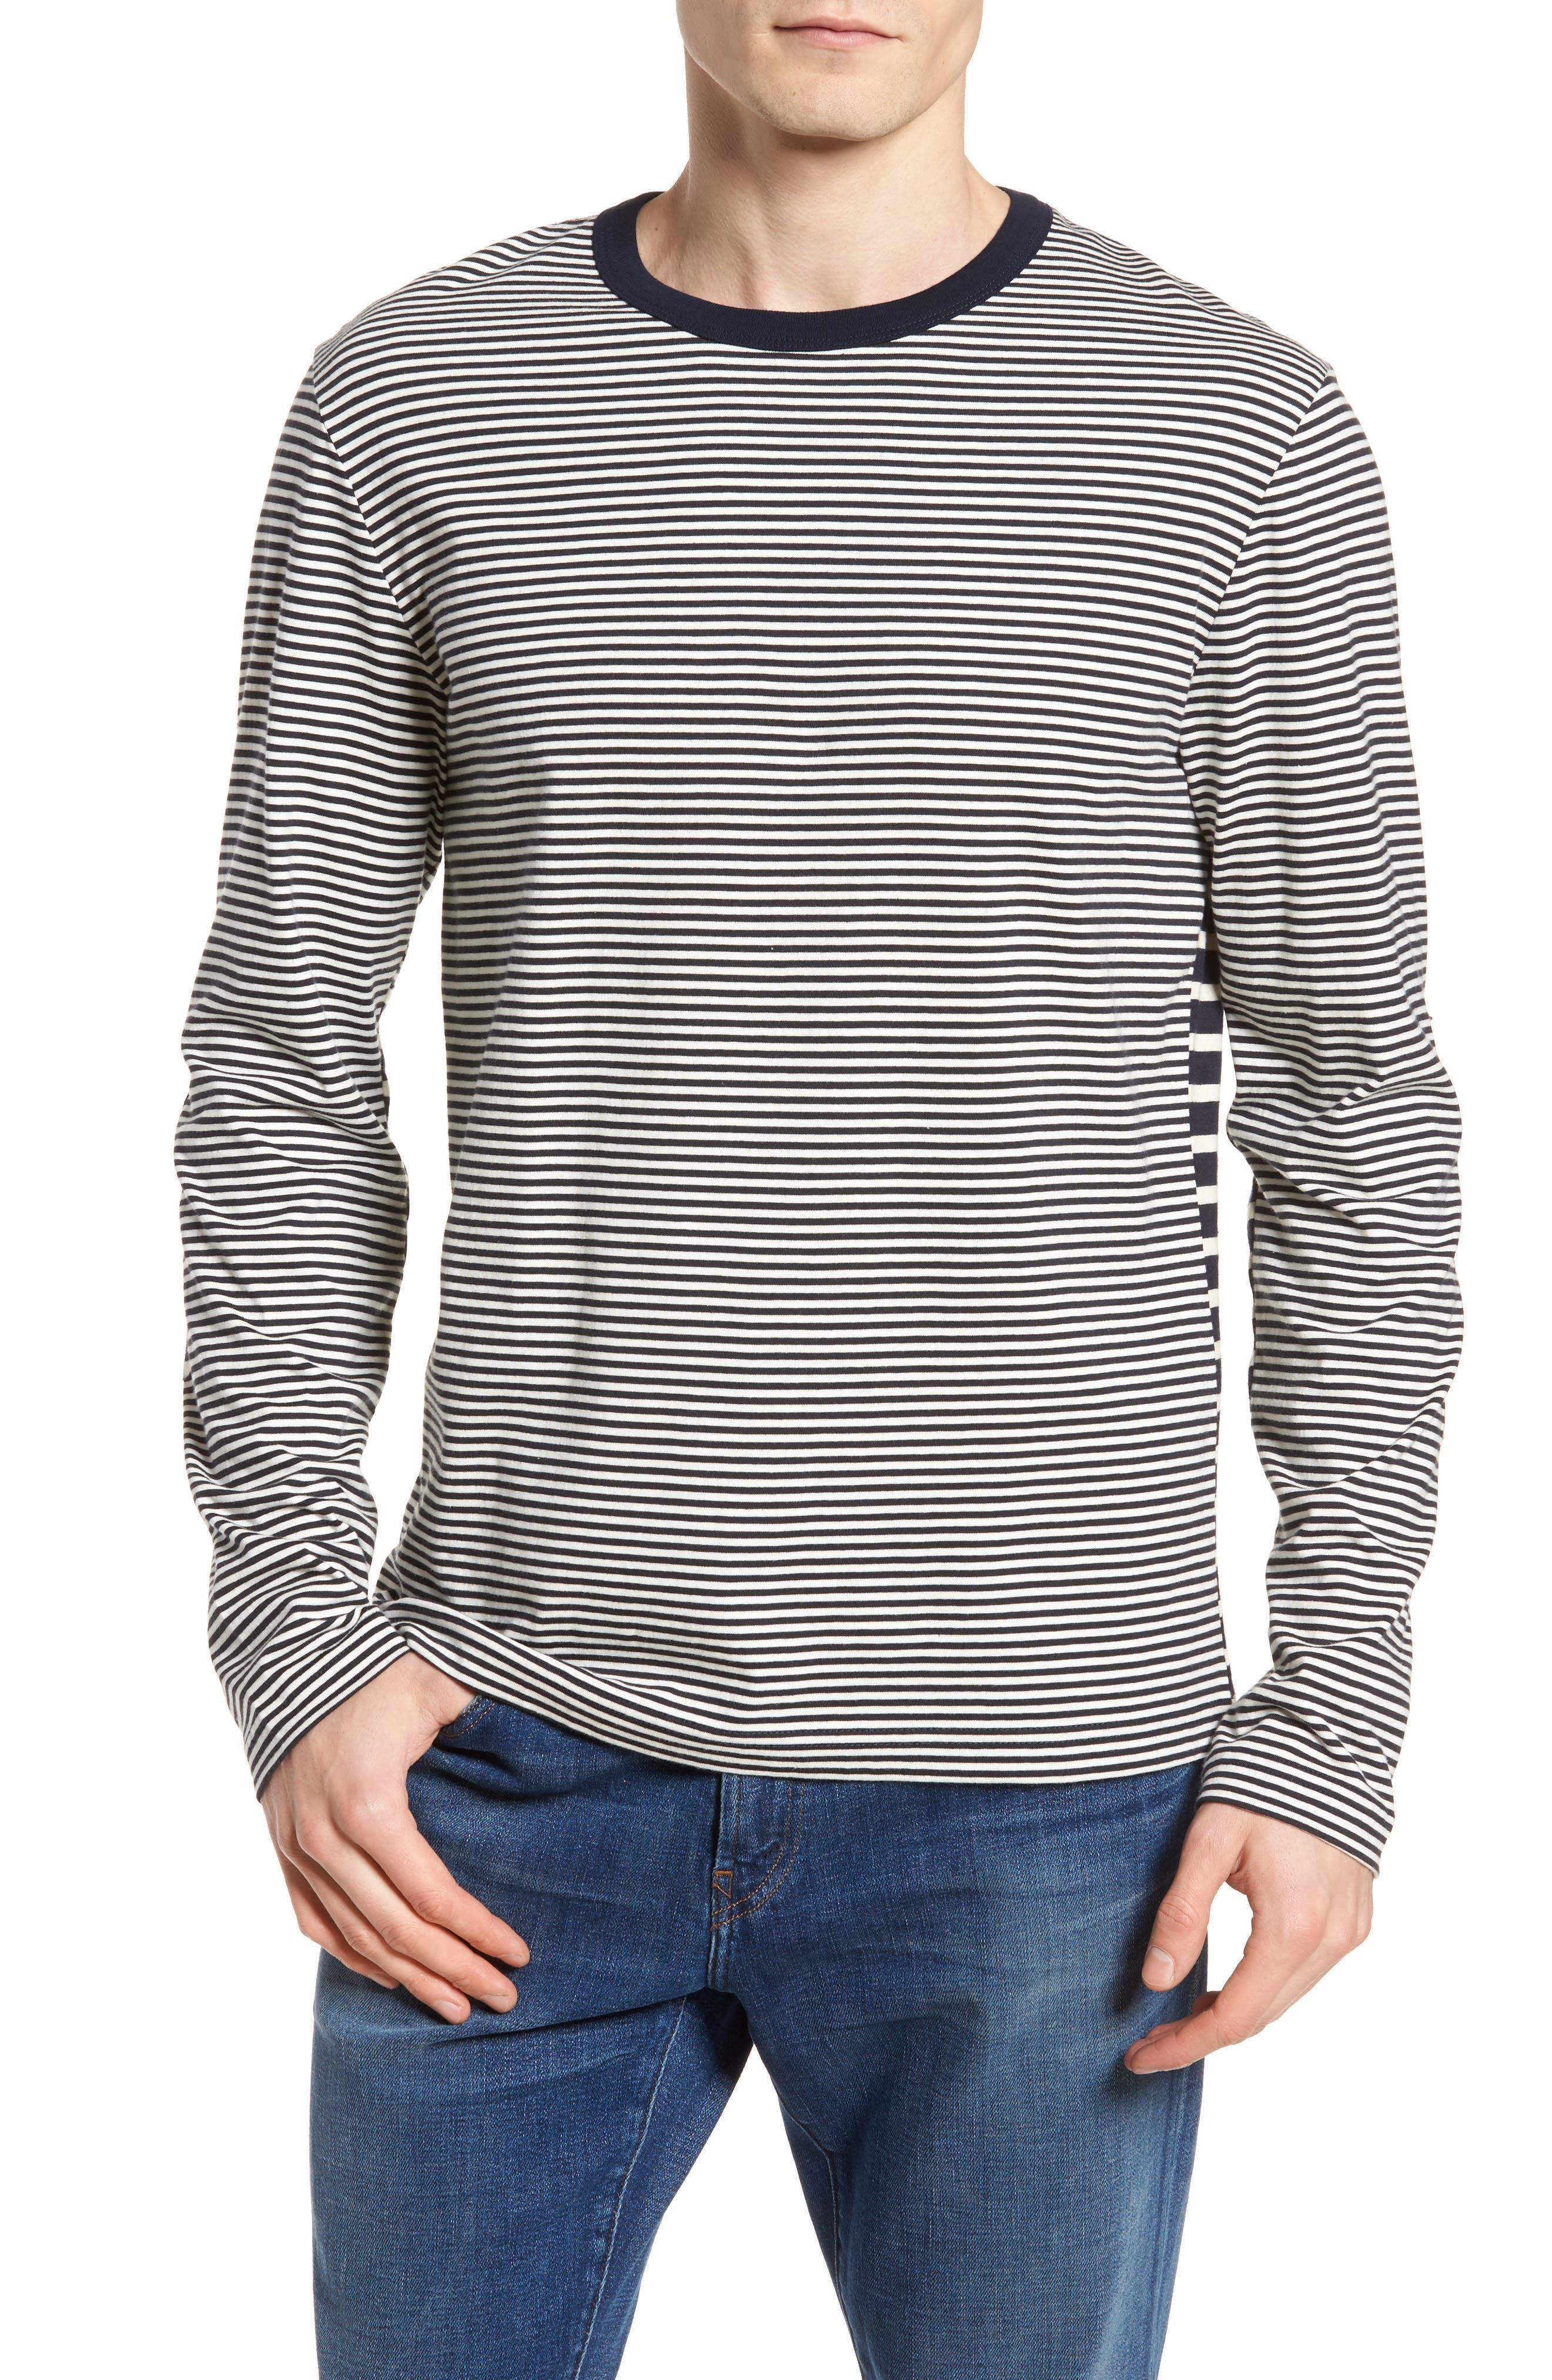 Mix Stripe Long Sleeve T-Shirt,                             Main thumbnail 1, color,                             020